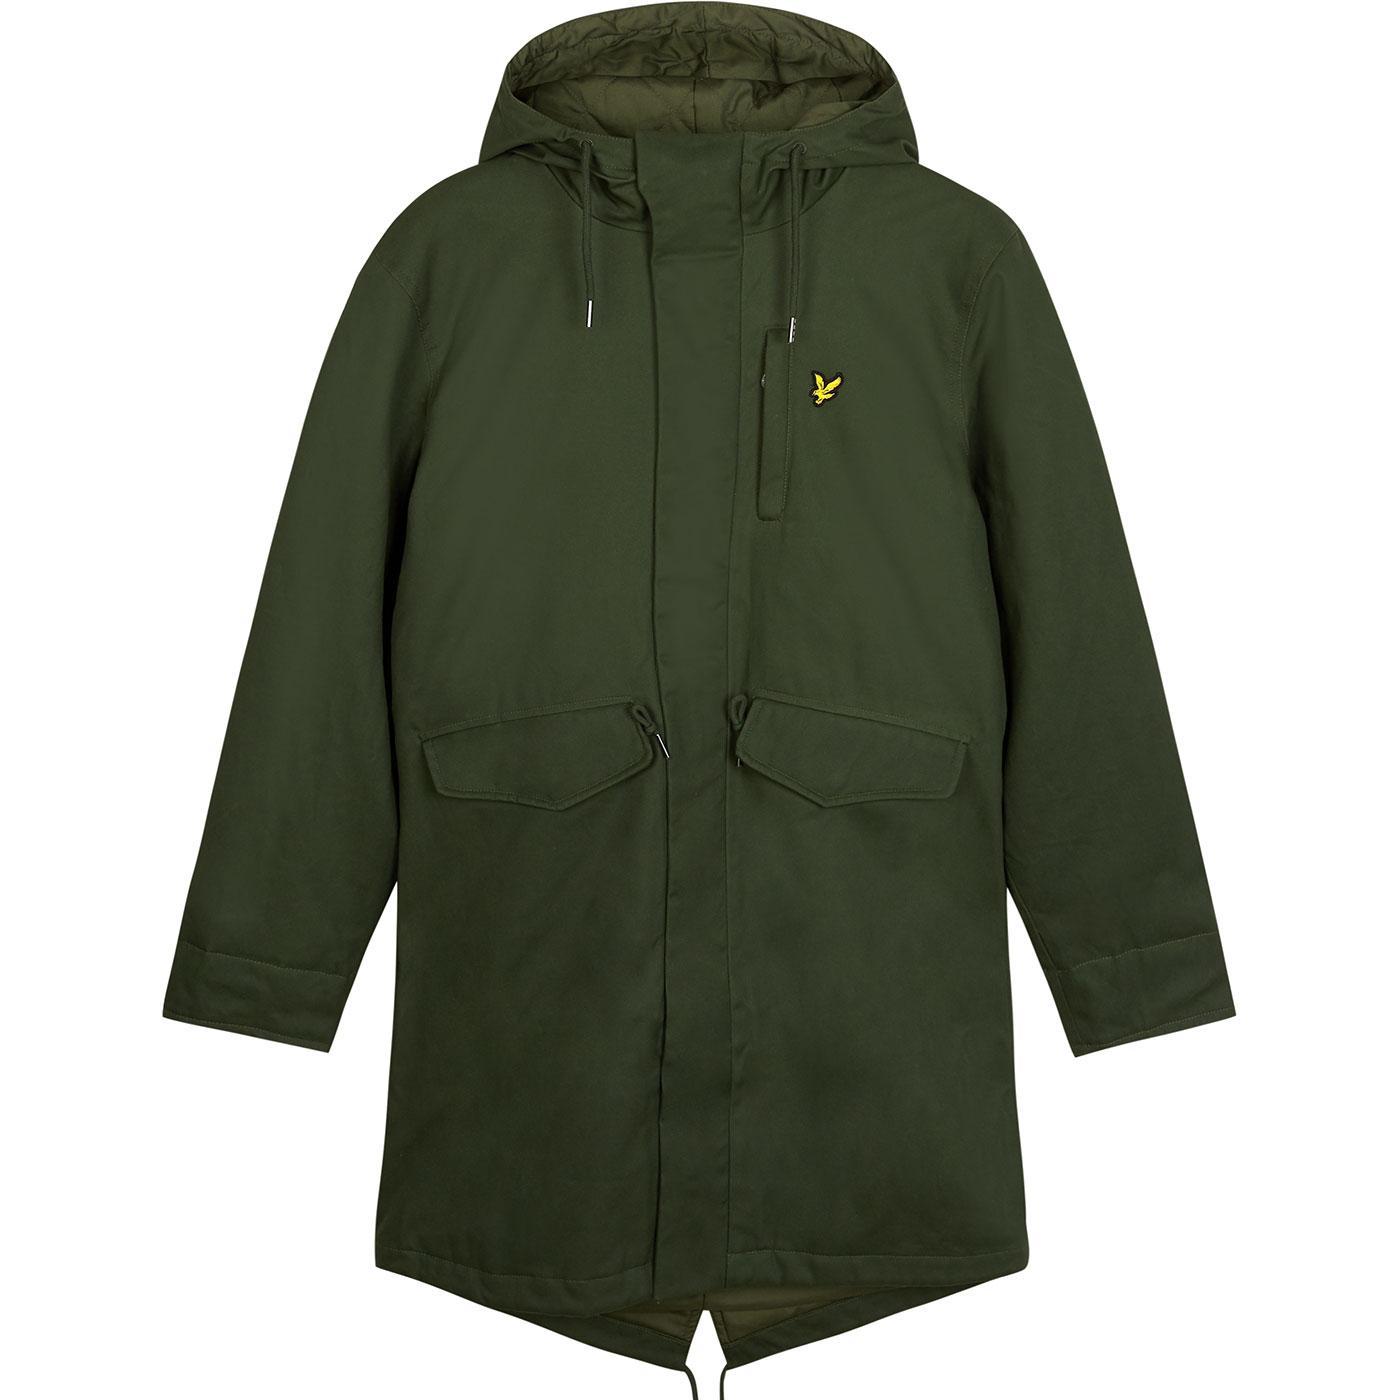 LYLE & SCOTT 60s Mod Waxed Fishtail Parka Jacket G